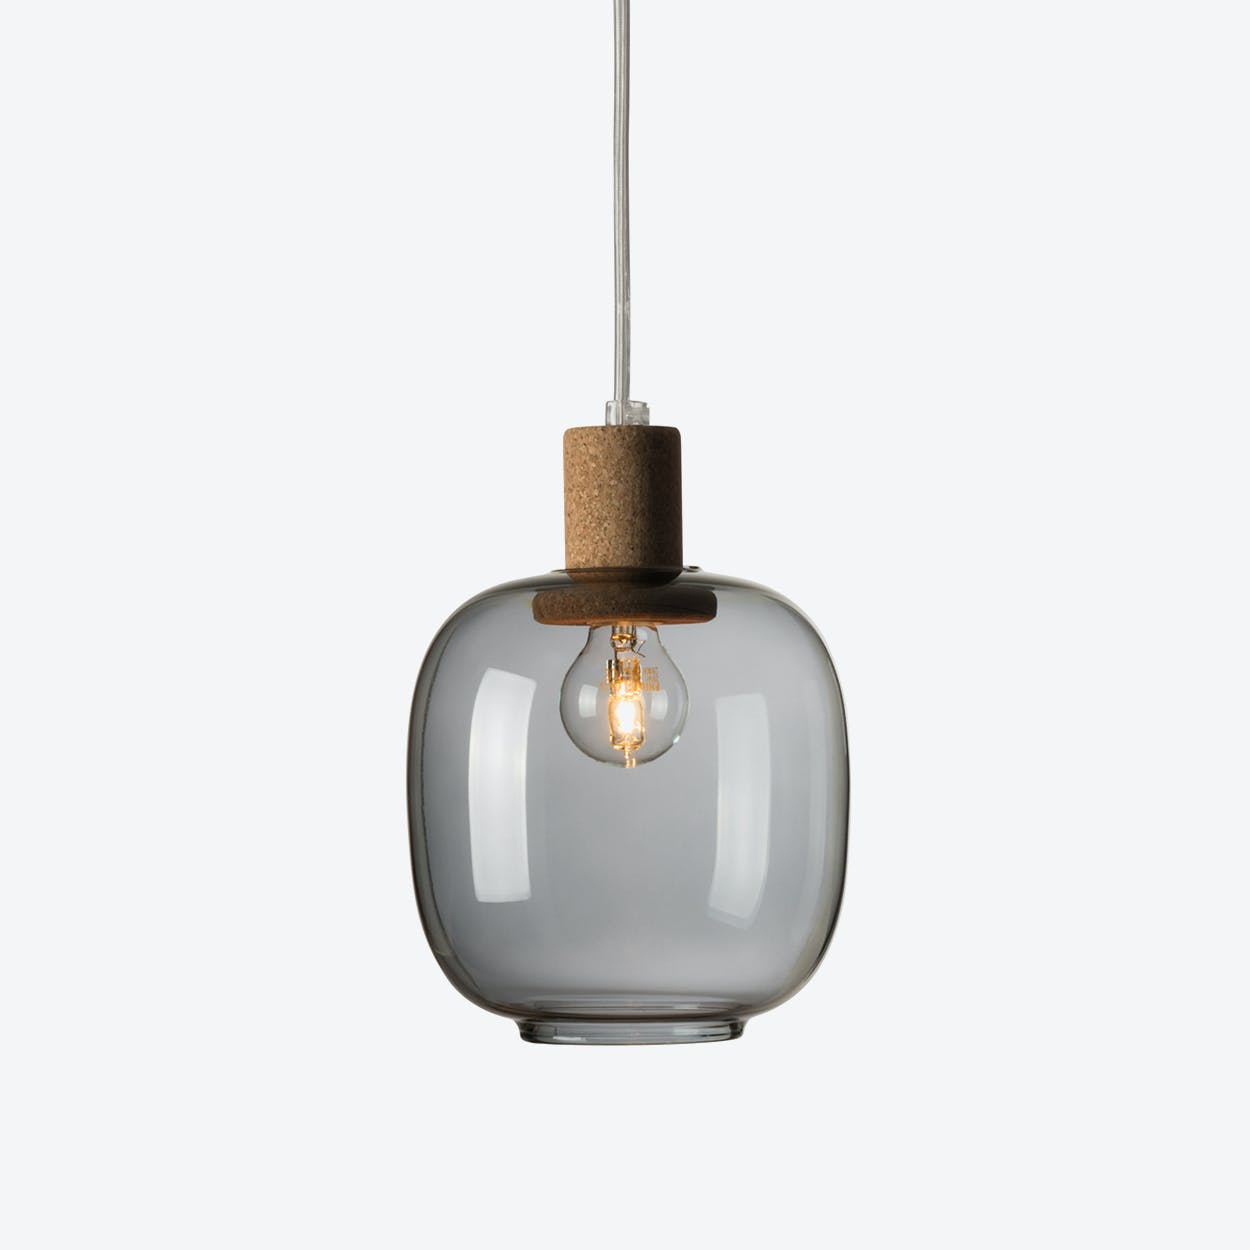 Picia Pendant Lamp in Grey